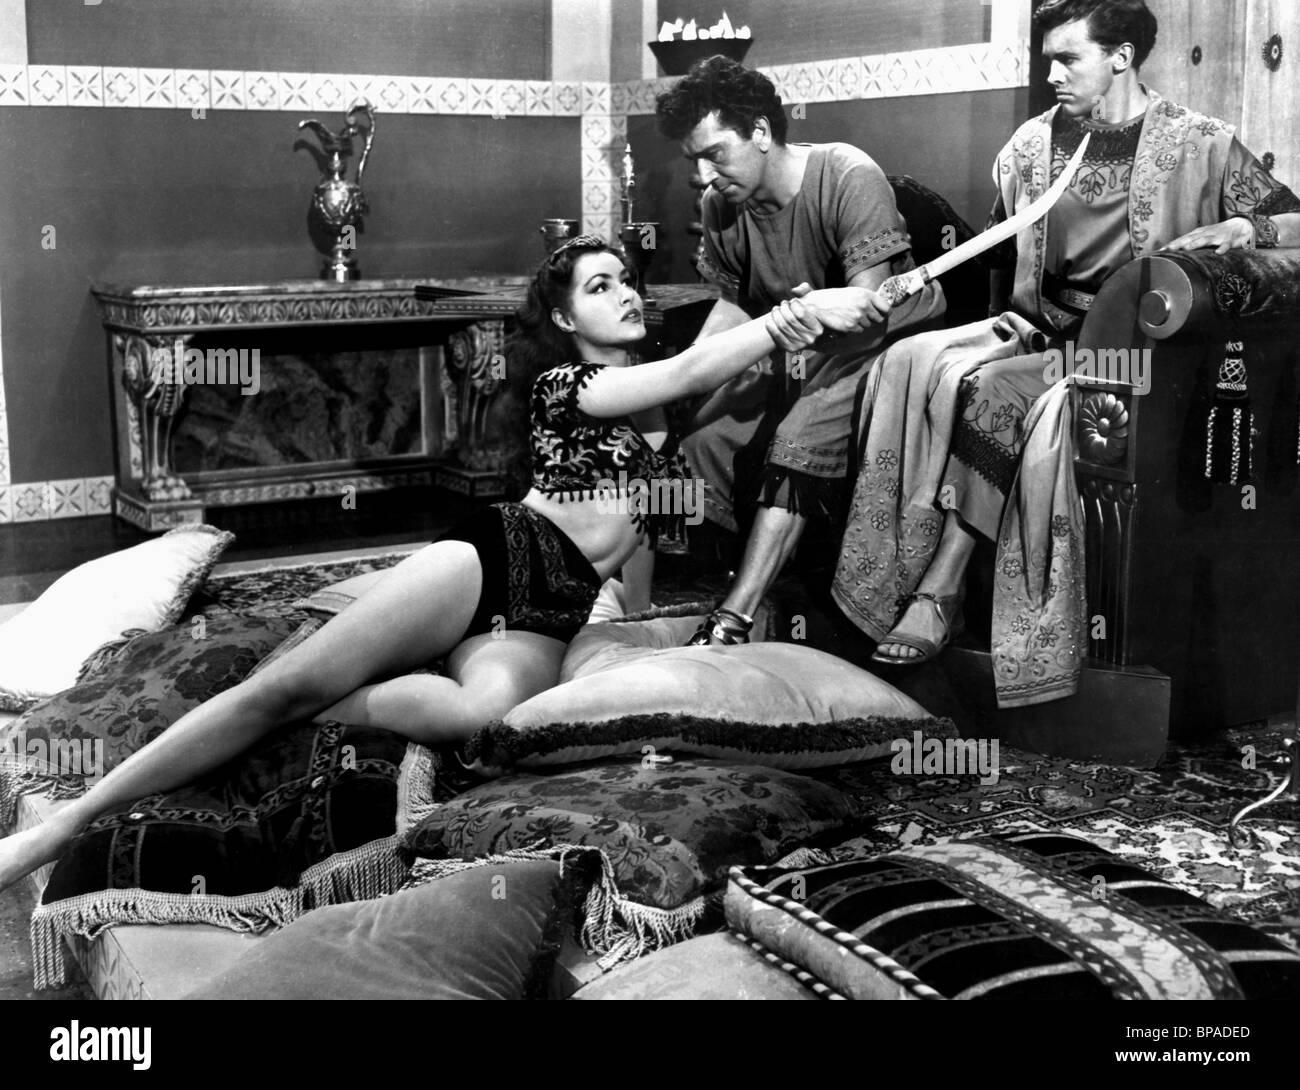 JULIE NEWMAR, RICHARD CONTE, TERRY KILBURN, SLAVES OF BABYLON, 1953 Stock Photo